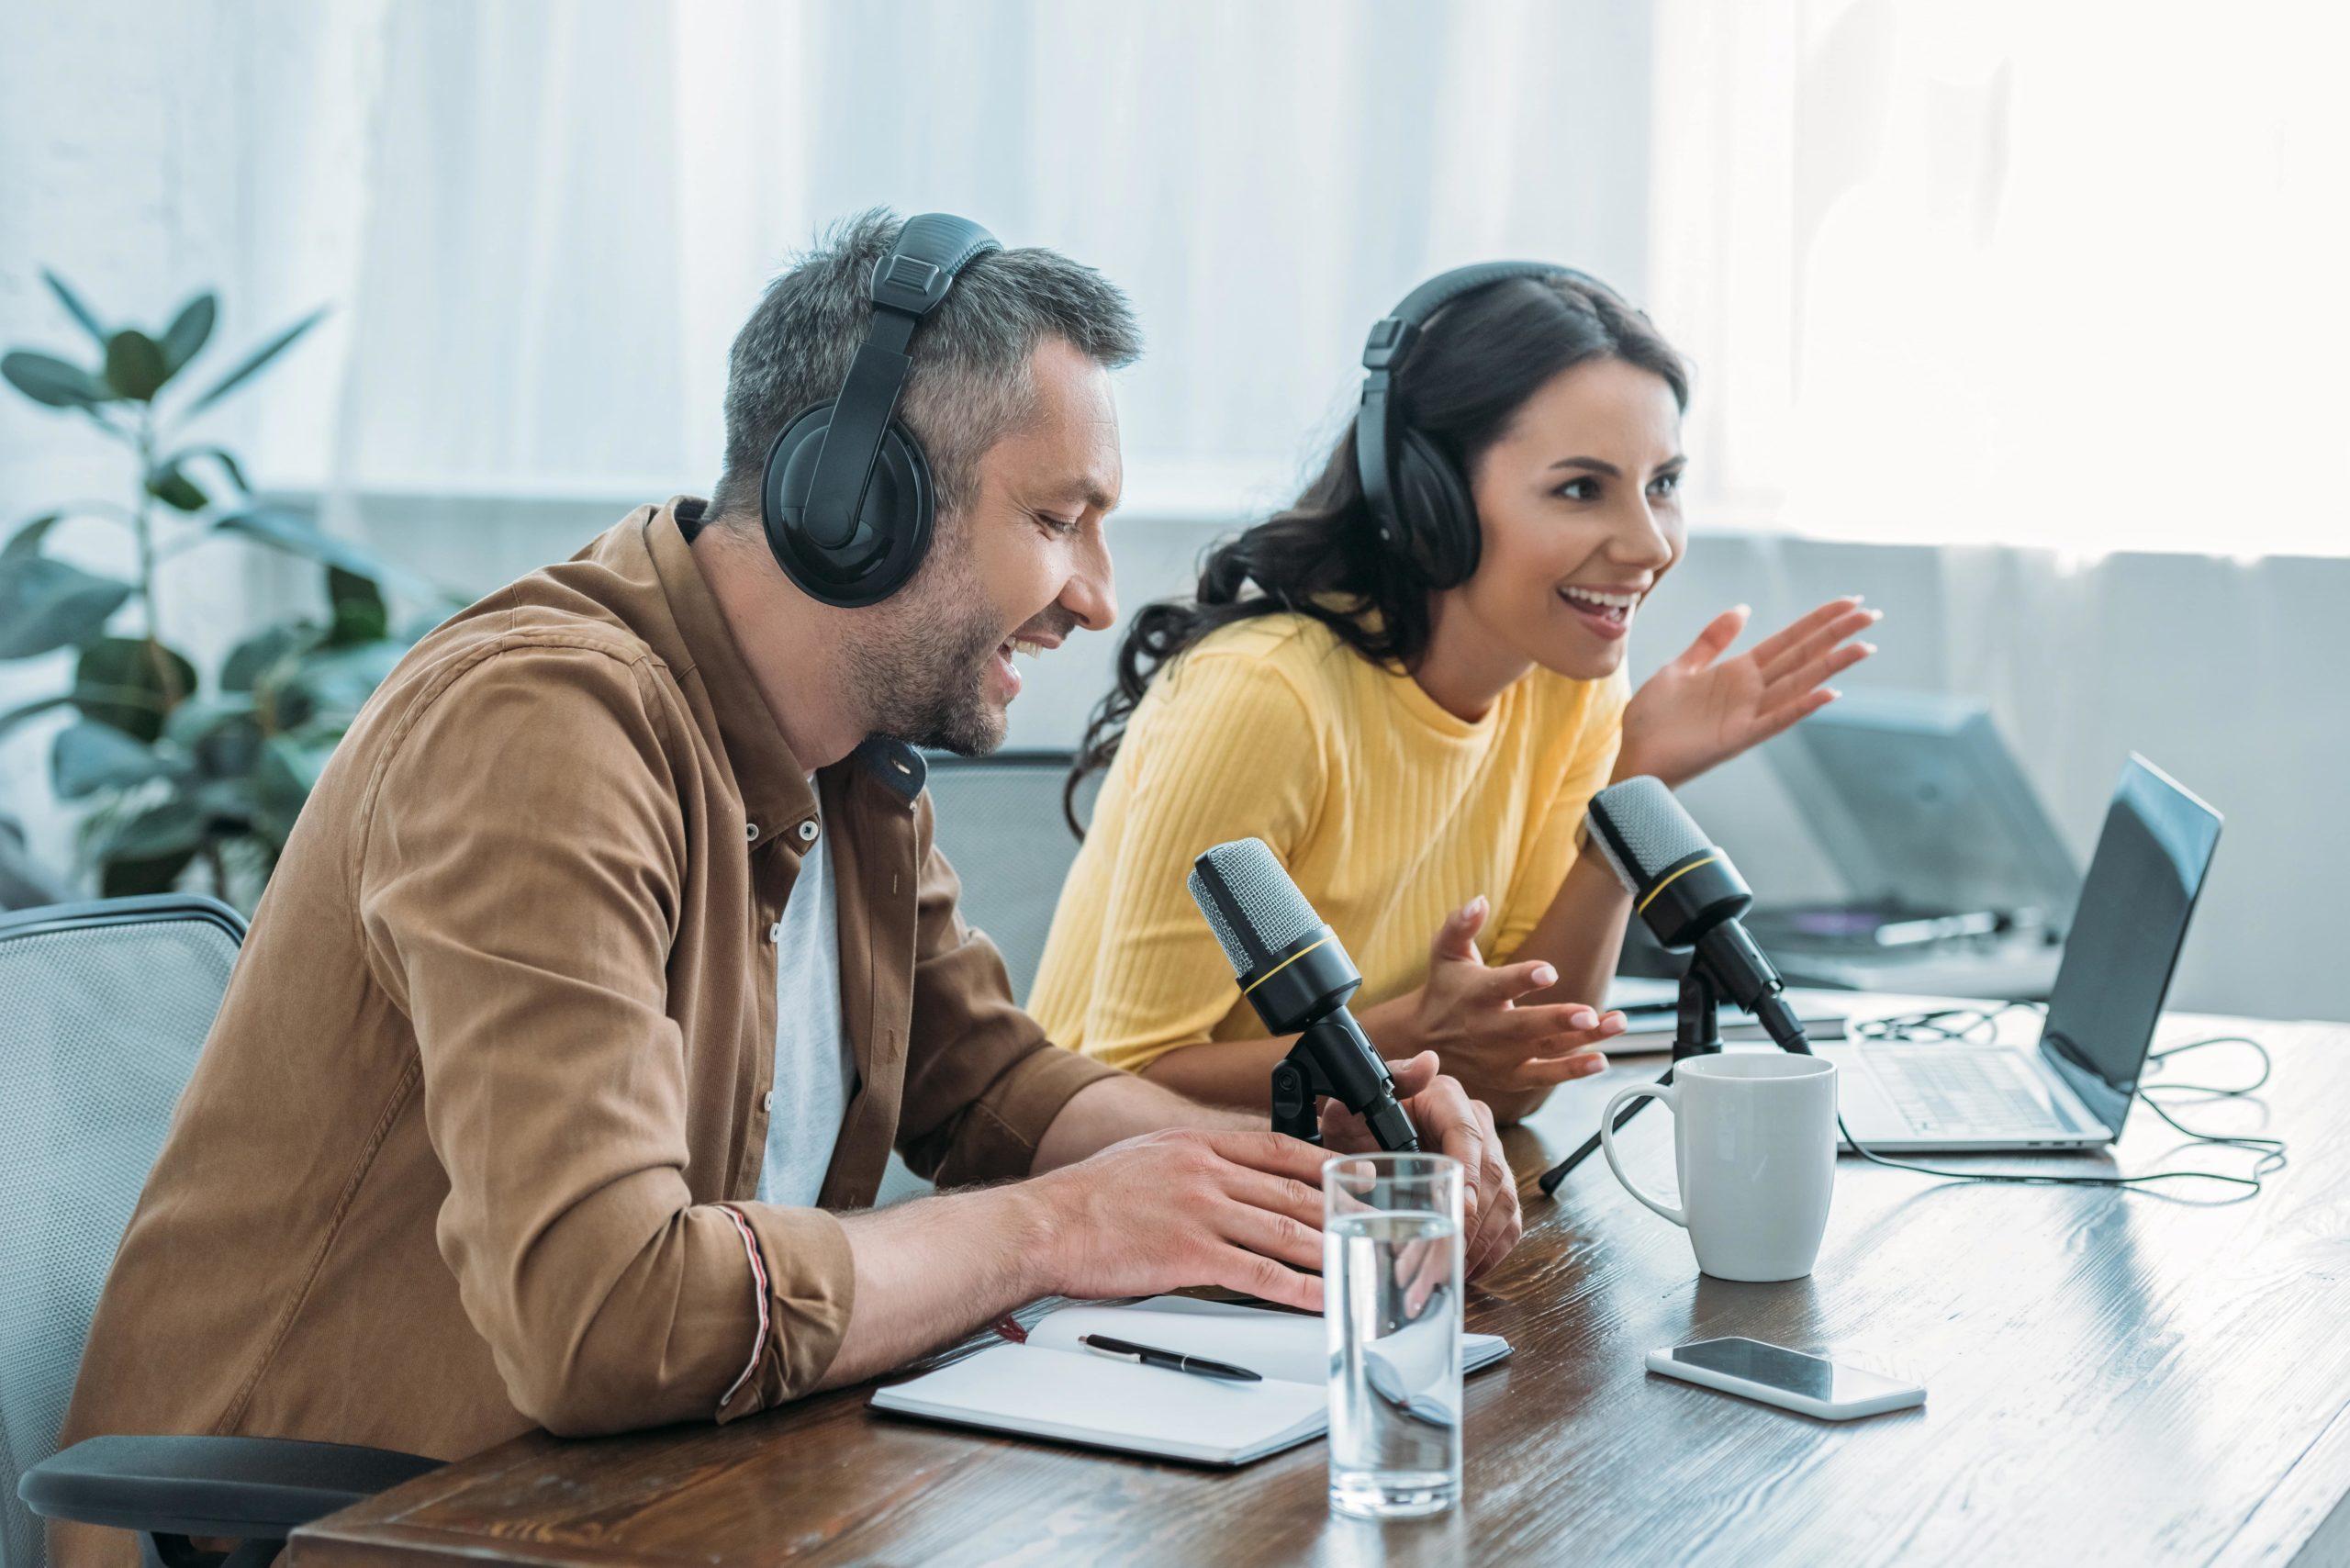 https://technoedgelearning.ca/wp-content/uploads/2021/10/two-cheerful-radio-hosts-in-headphones-recording-p-2021-09-01-14-40-25-utc-min-scaled.jpg